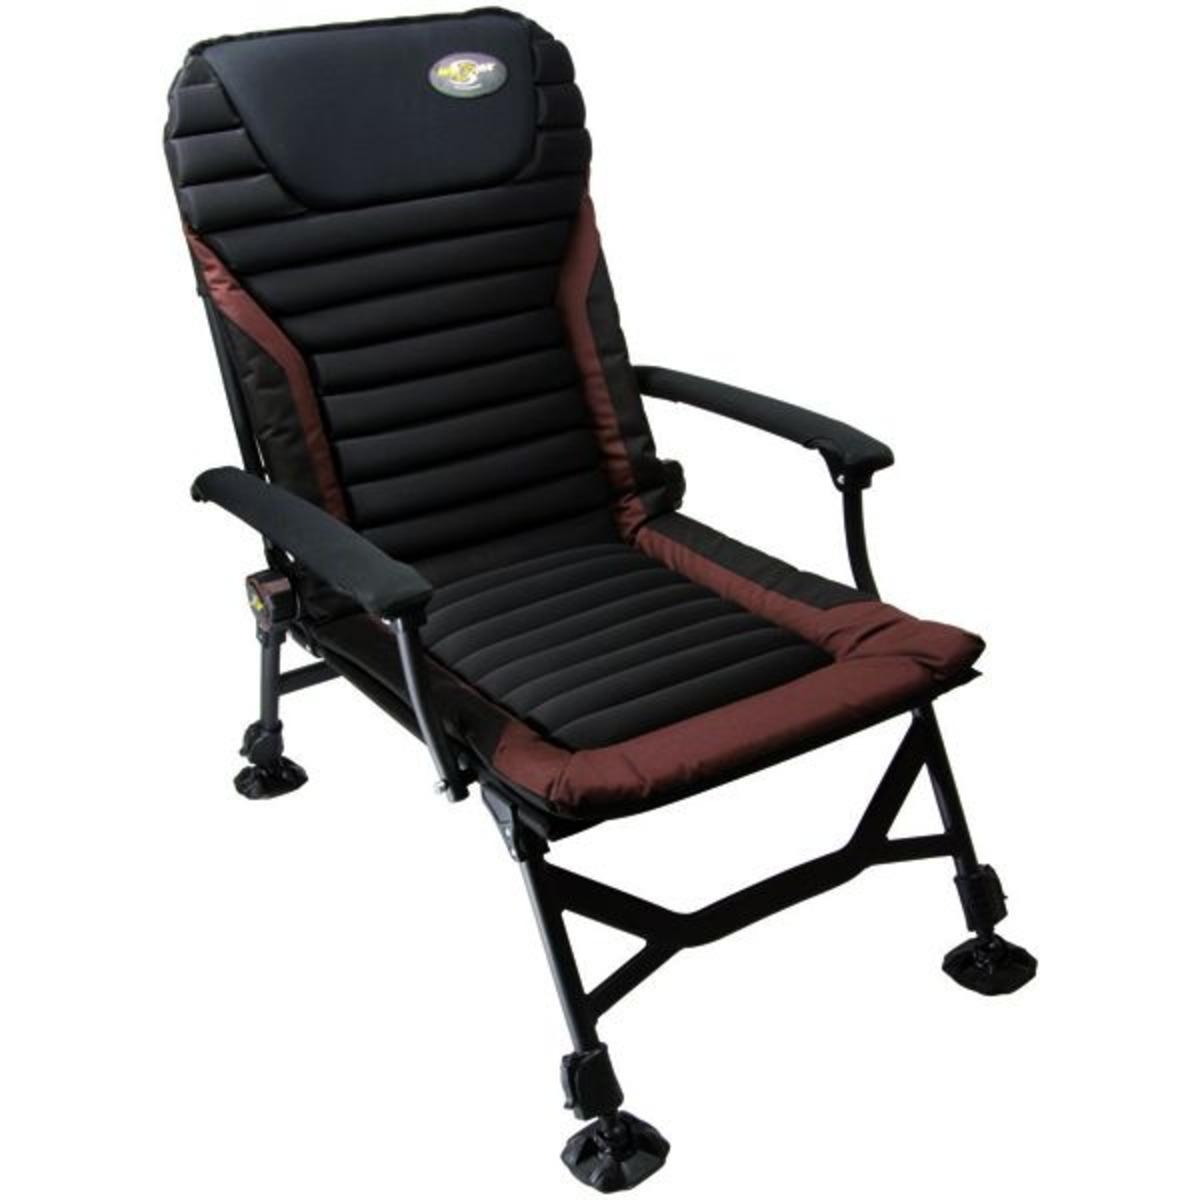 Carp Spirit Kolossal Level Chair - 7 kg - 95-105x55x38-48 cm